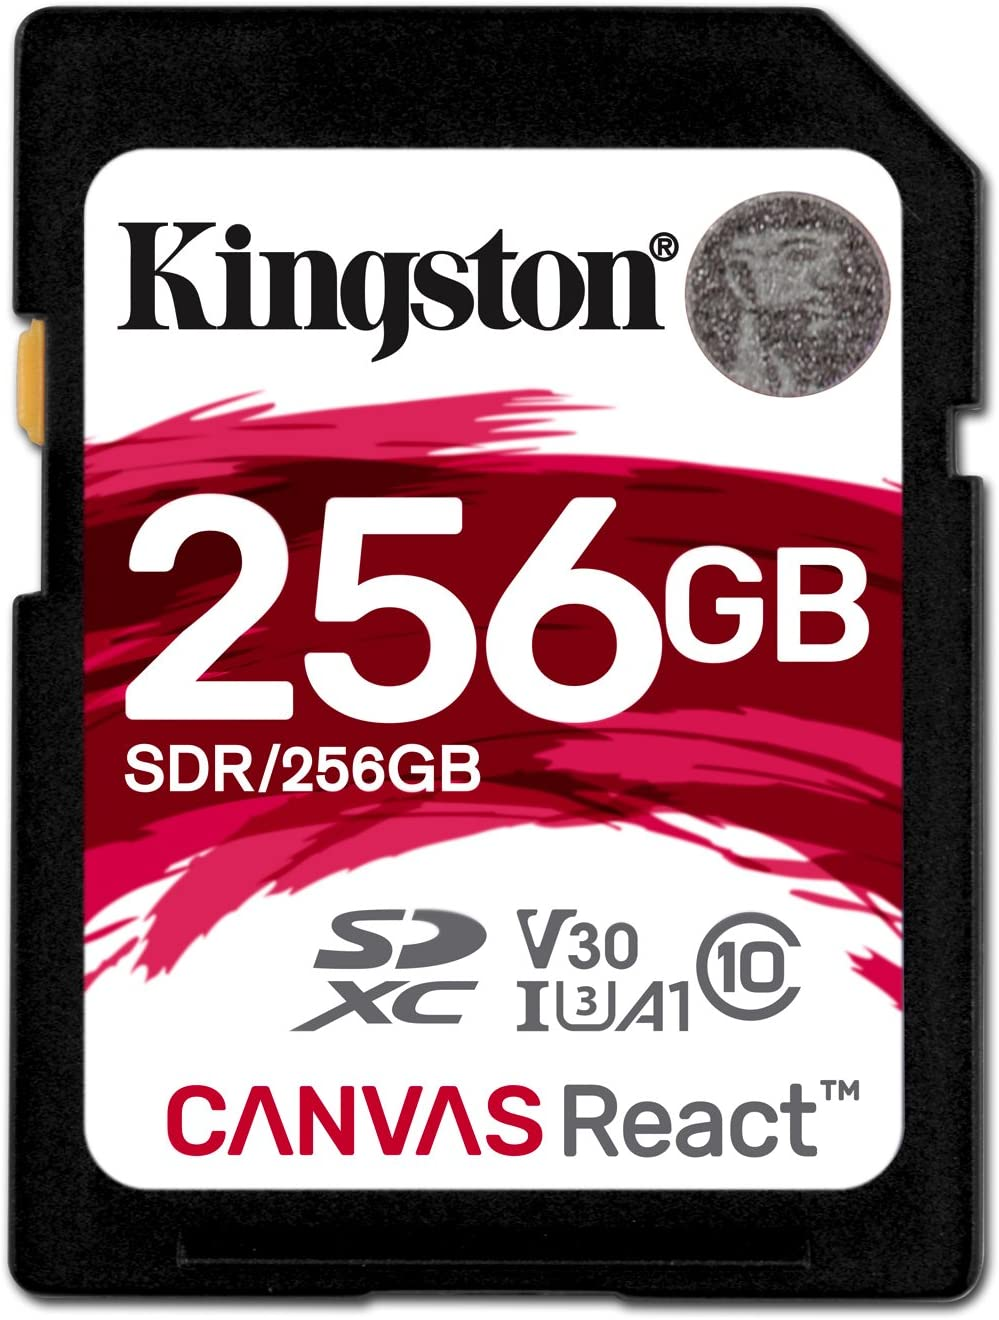 Kingston Canvas React 256GB SDXC Class 10 SD Memory Card UHS-I 100MB/s R Flash Memory High Speed SD Card (SDR/256GB)